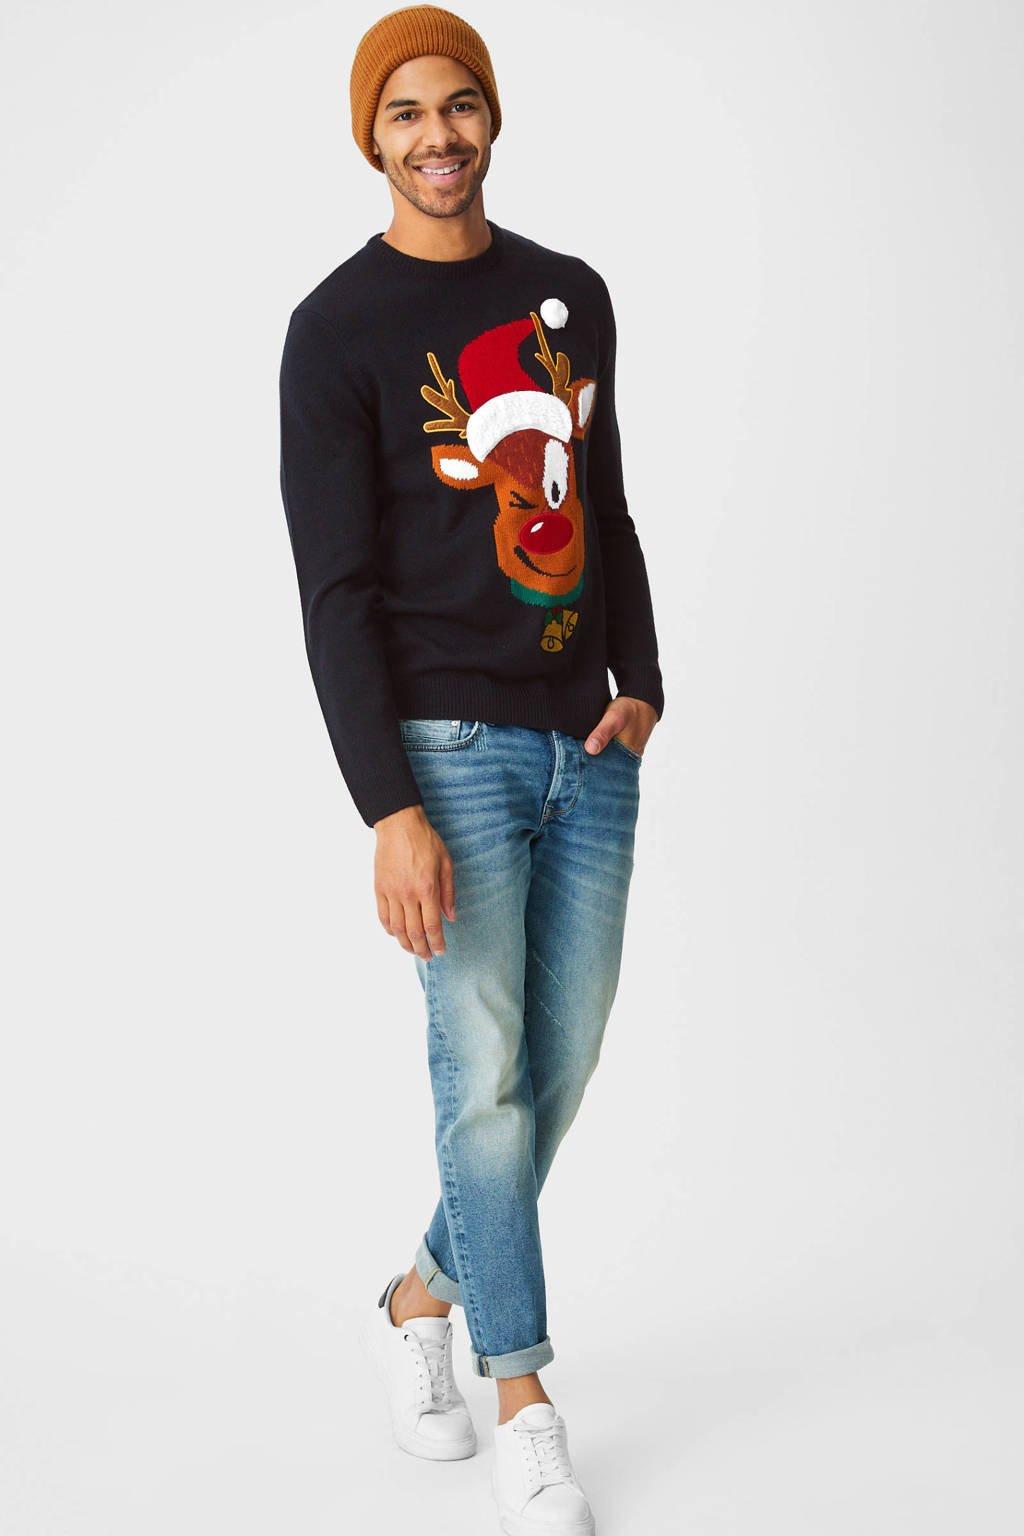 C&A Angelo Litrico  kersttrui donkerblauw, Donkerblauw